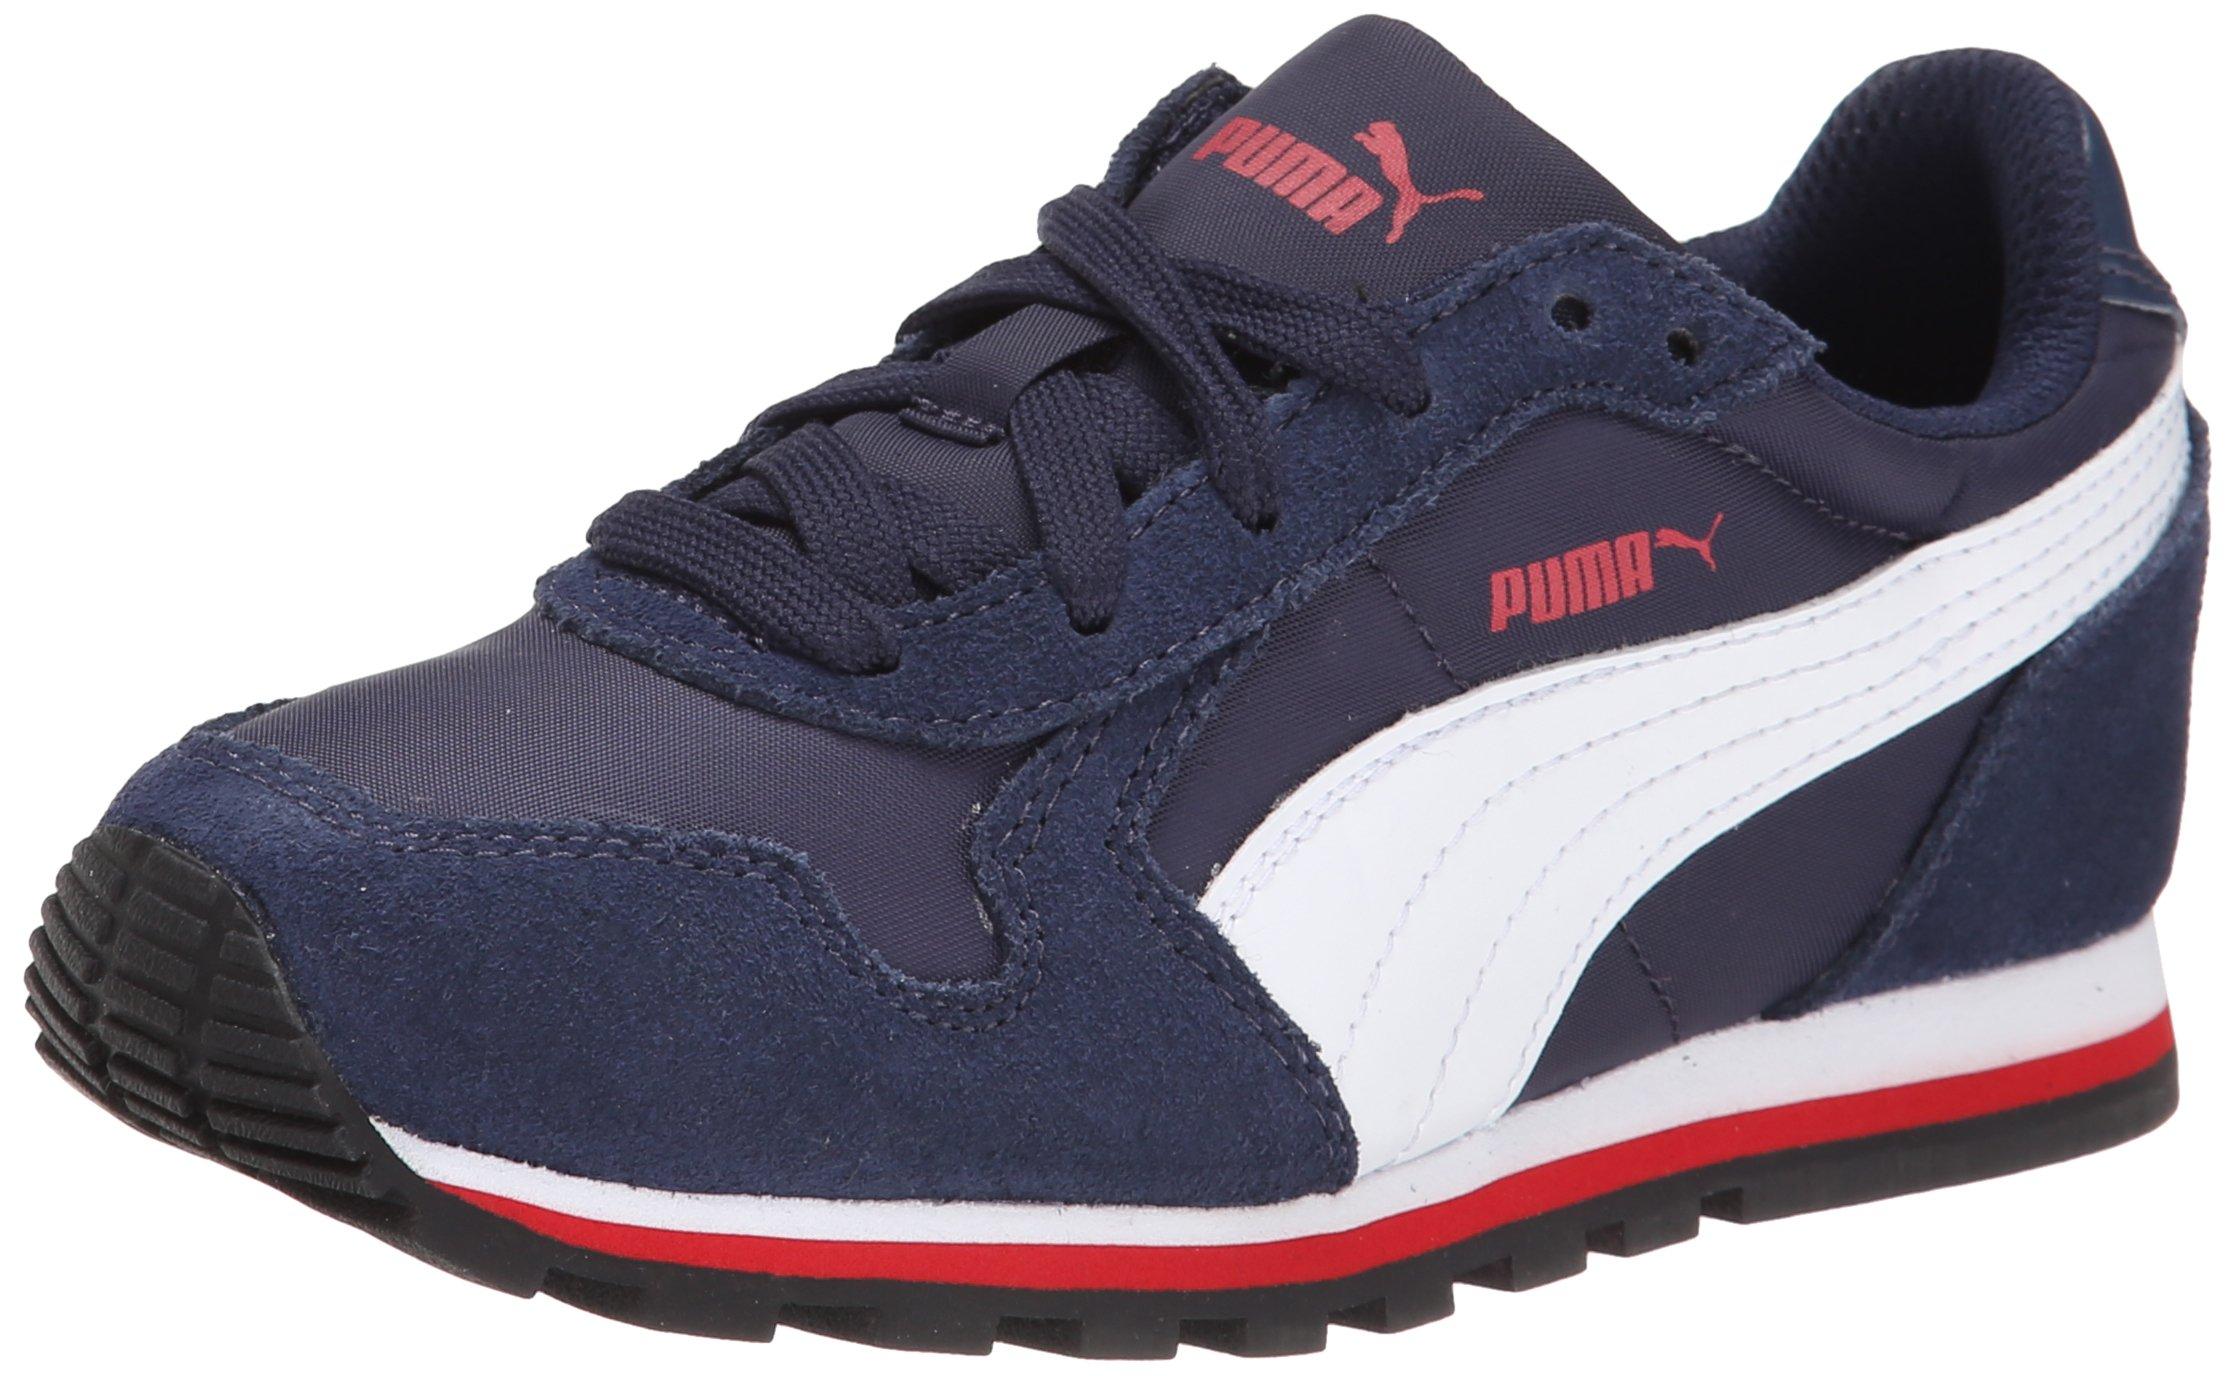 PUMA ST Runner NL JR Sneaker (Little Kid/Big Kid), Peacoat/White/High Risk Red, 6 M US Big Kid